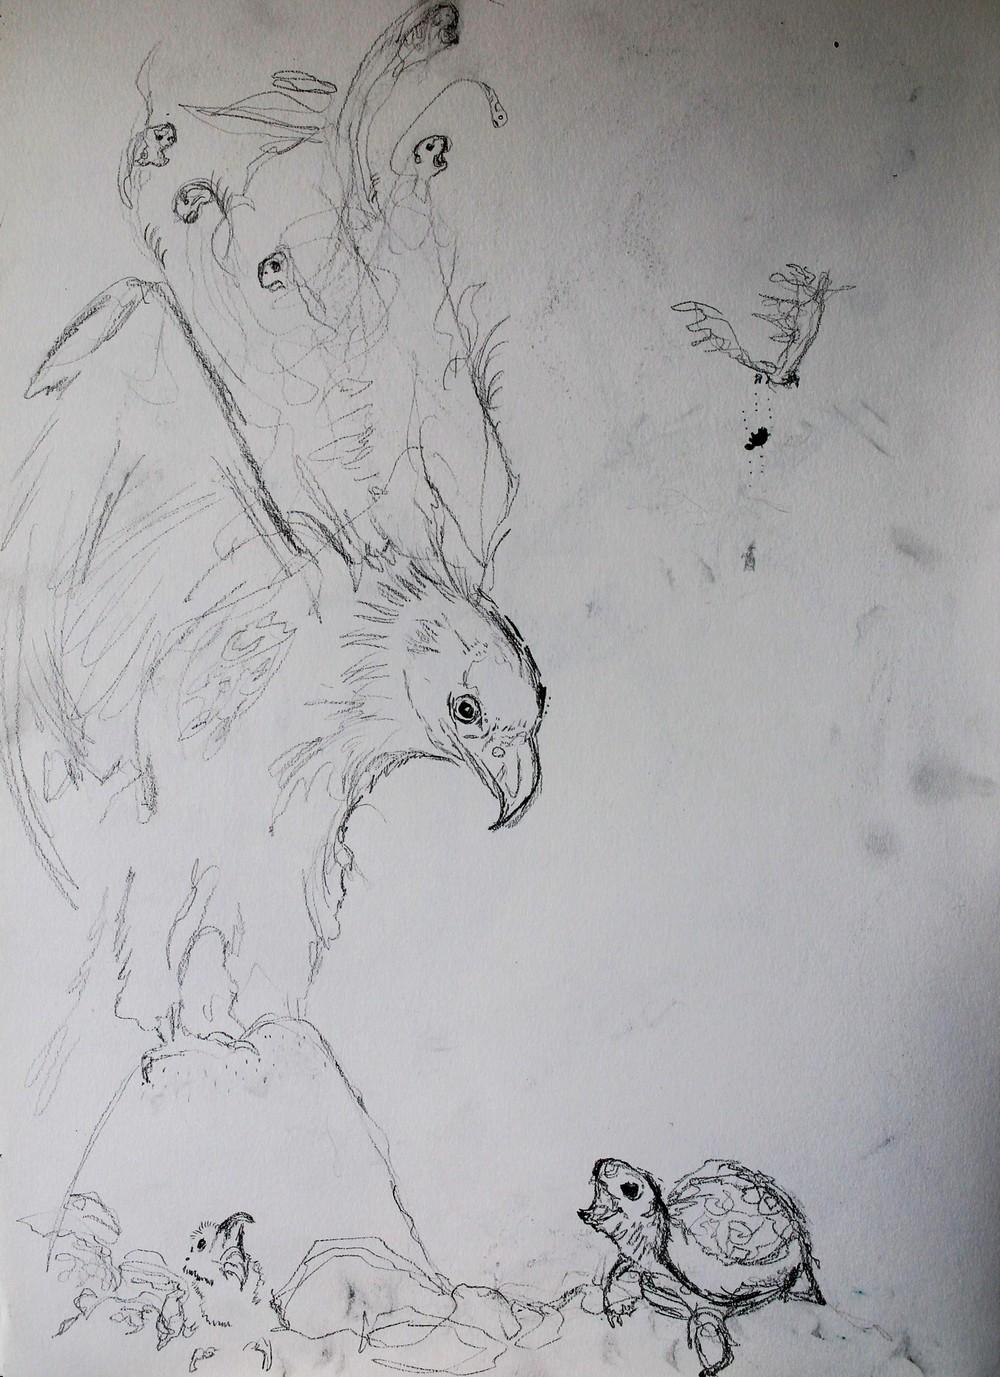 eagle-tortoise-sketch5.jpg.JPG